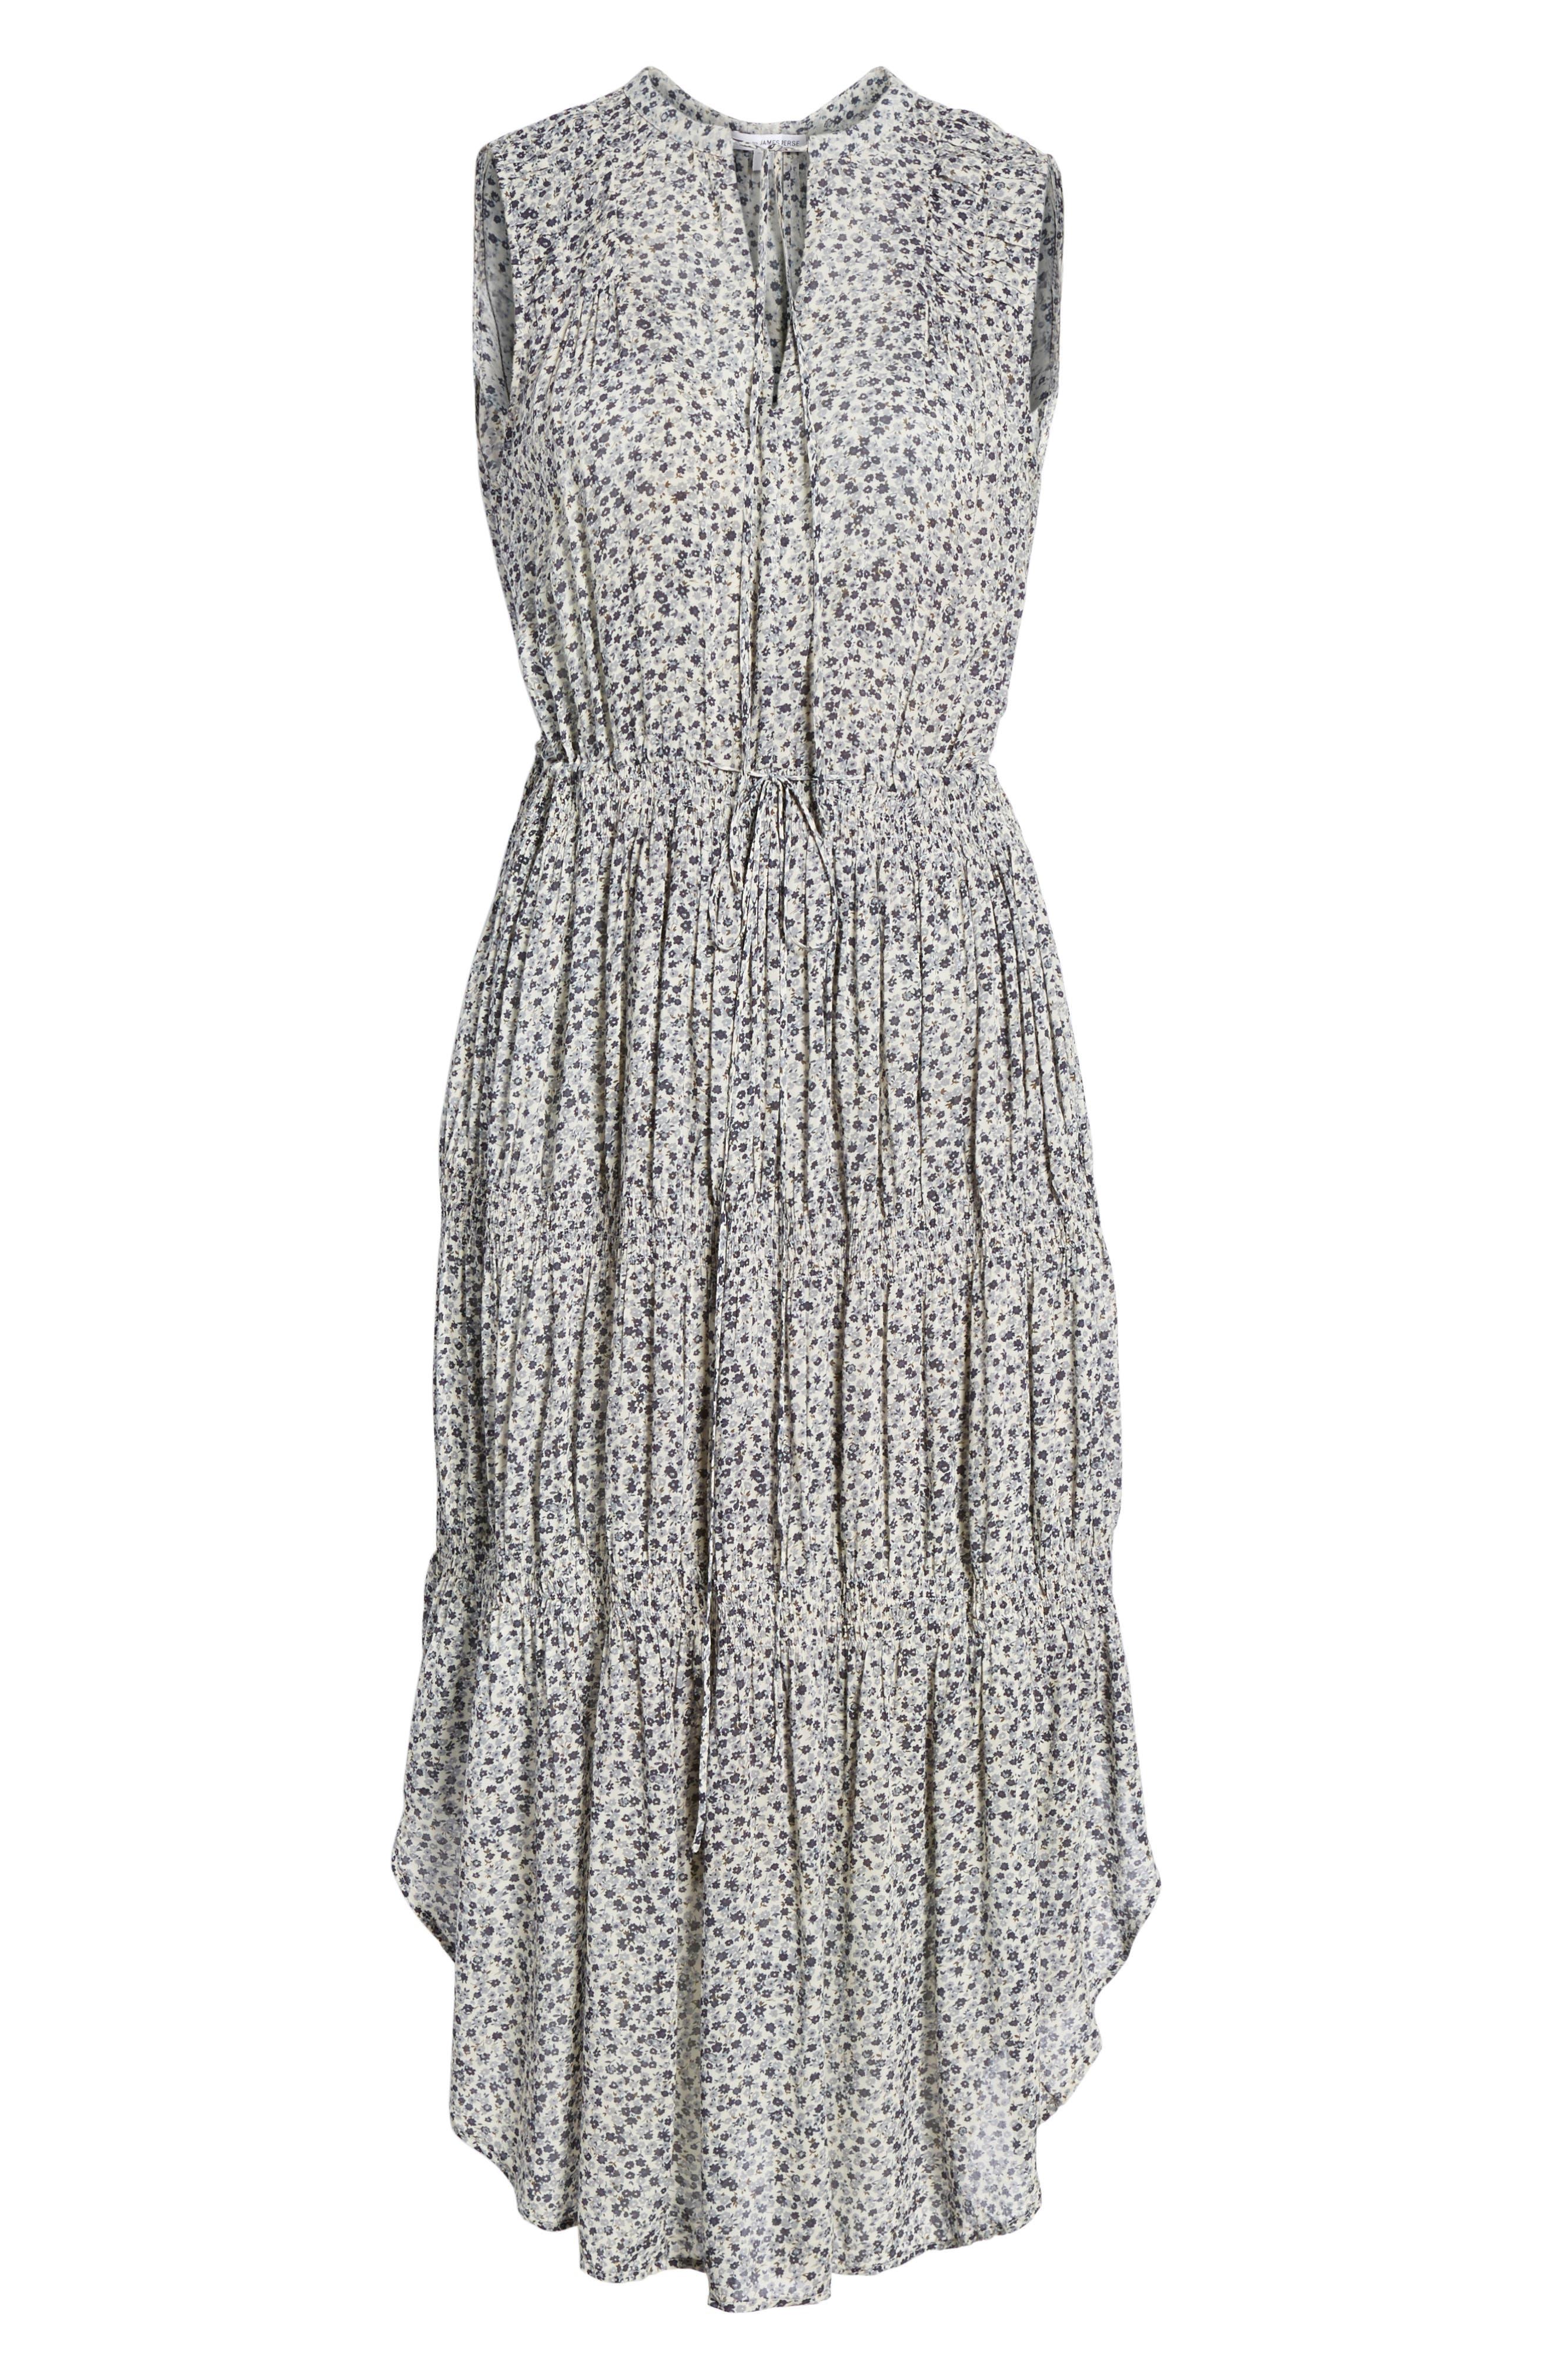 Floral Pleated Midi Dress,                             Alternate thumbnail 6, color,                             082